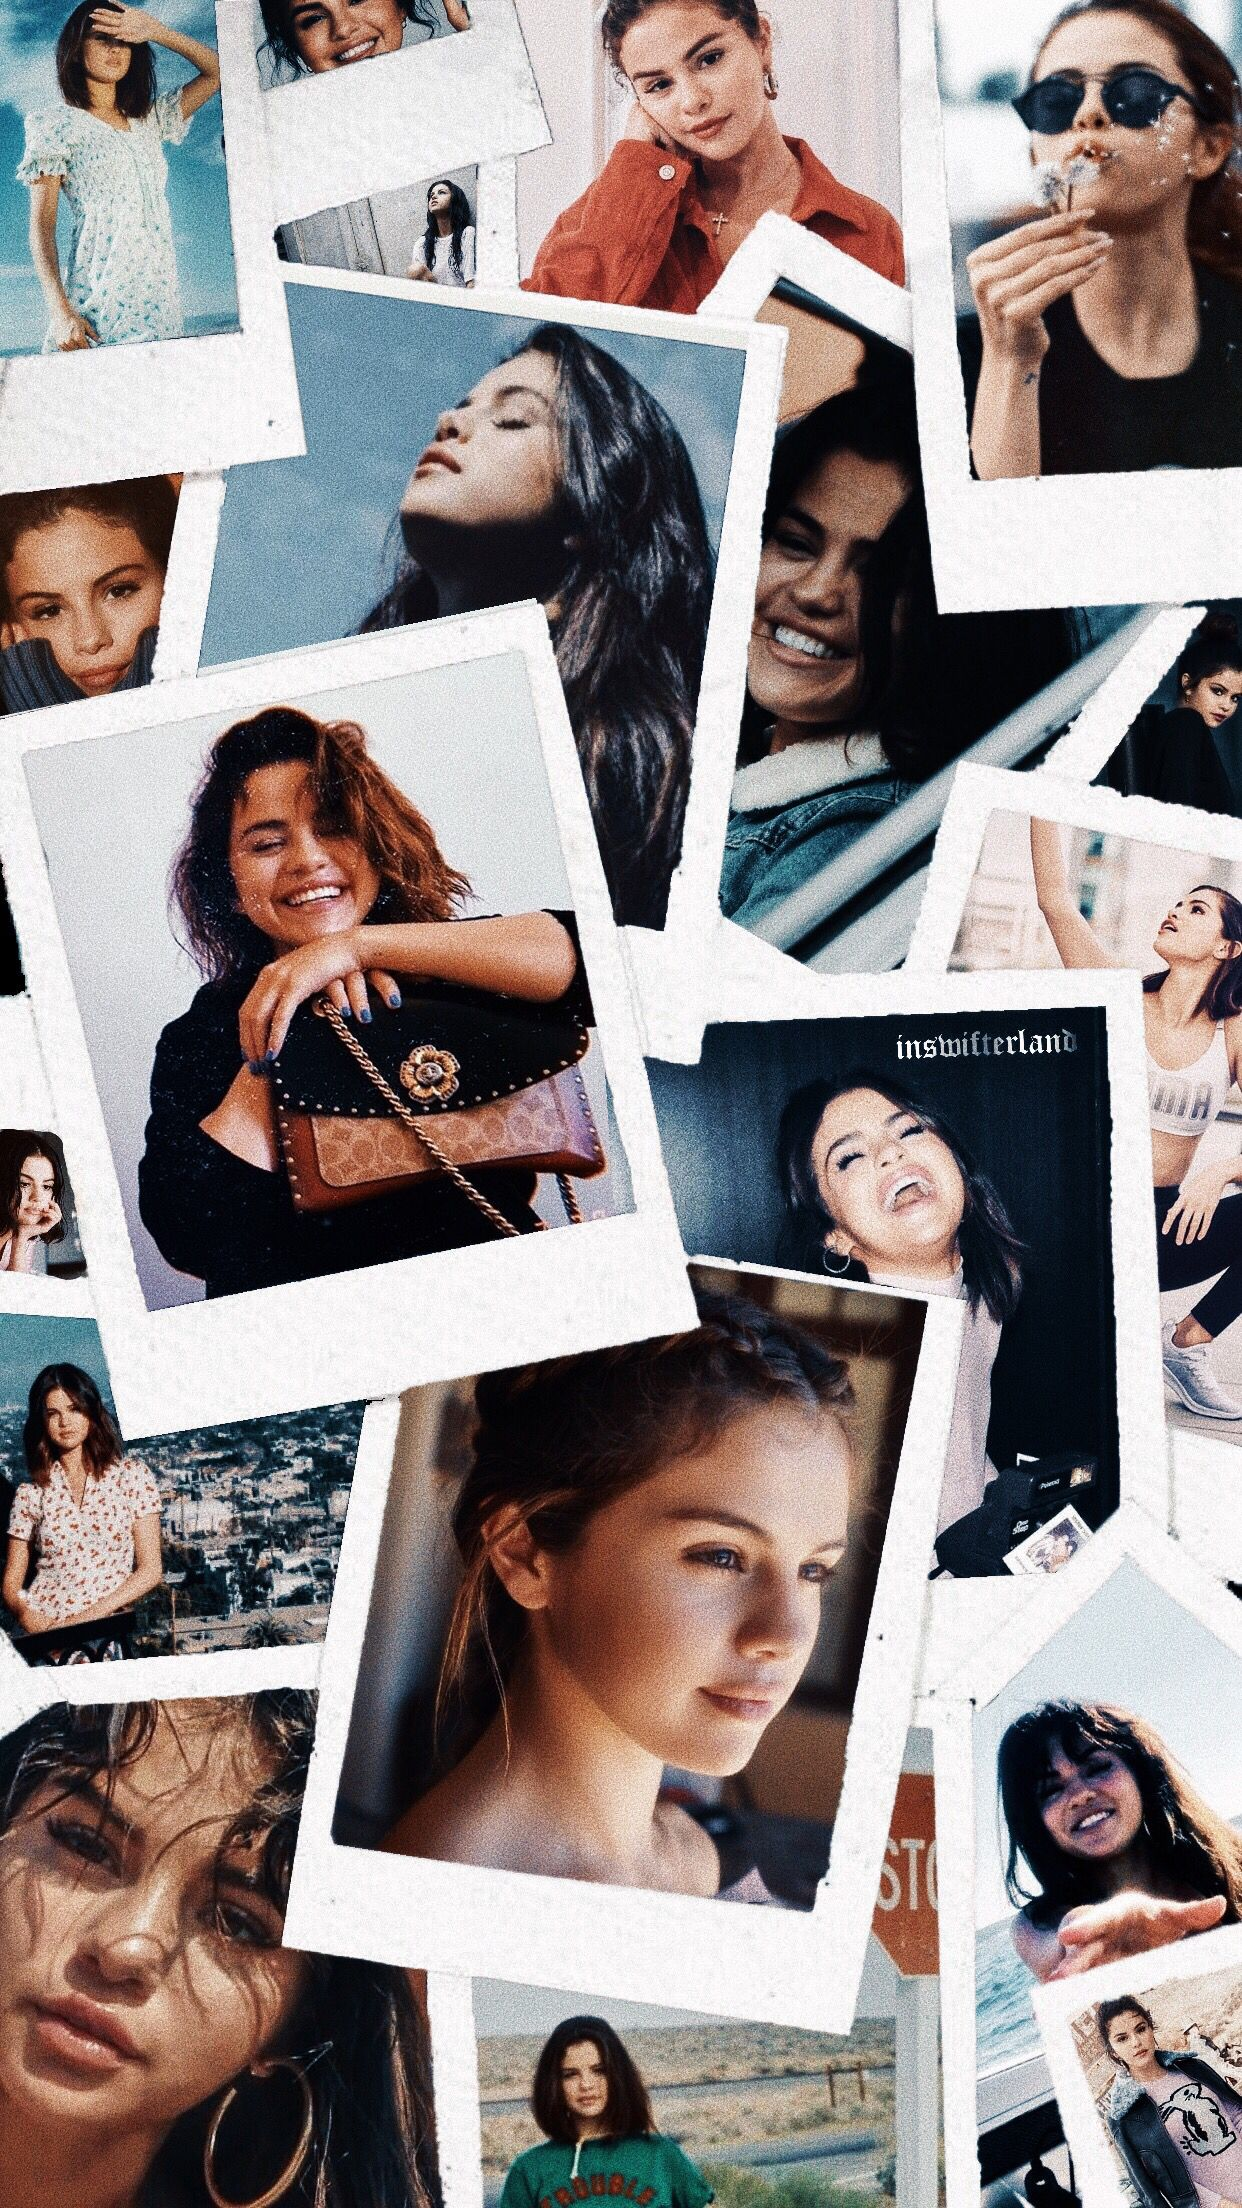 Selena Gomez Wallpaper Selena Gomez Wallpaper Selena Gomez Pictures Selena Gomez Tumblr